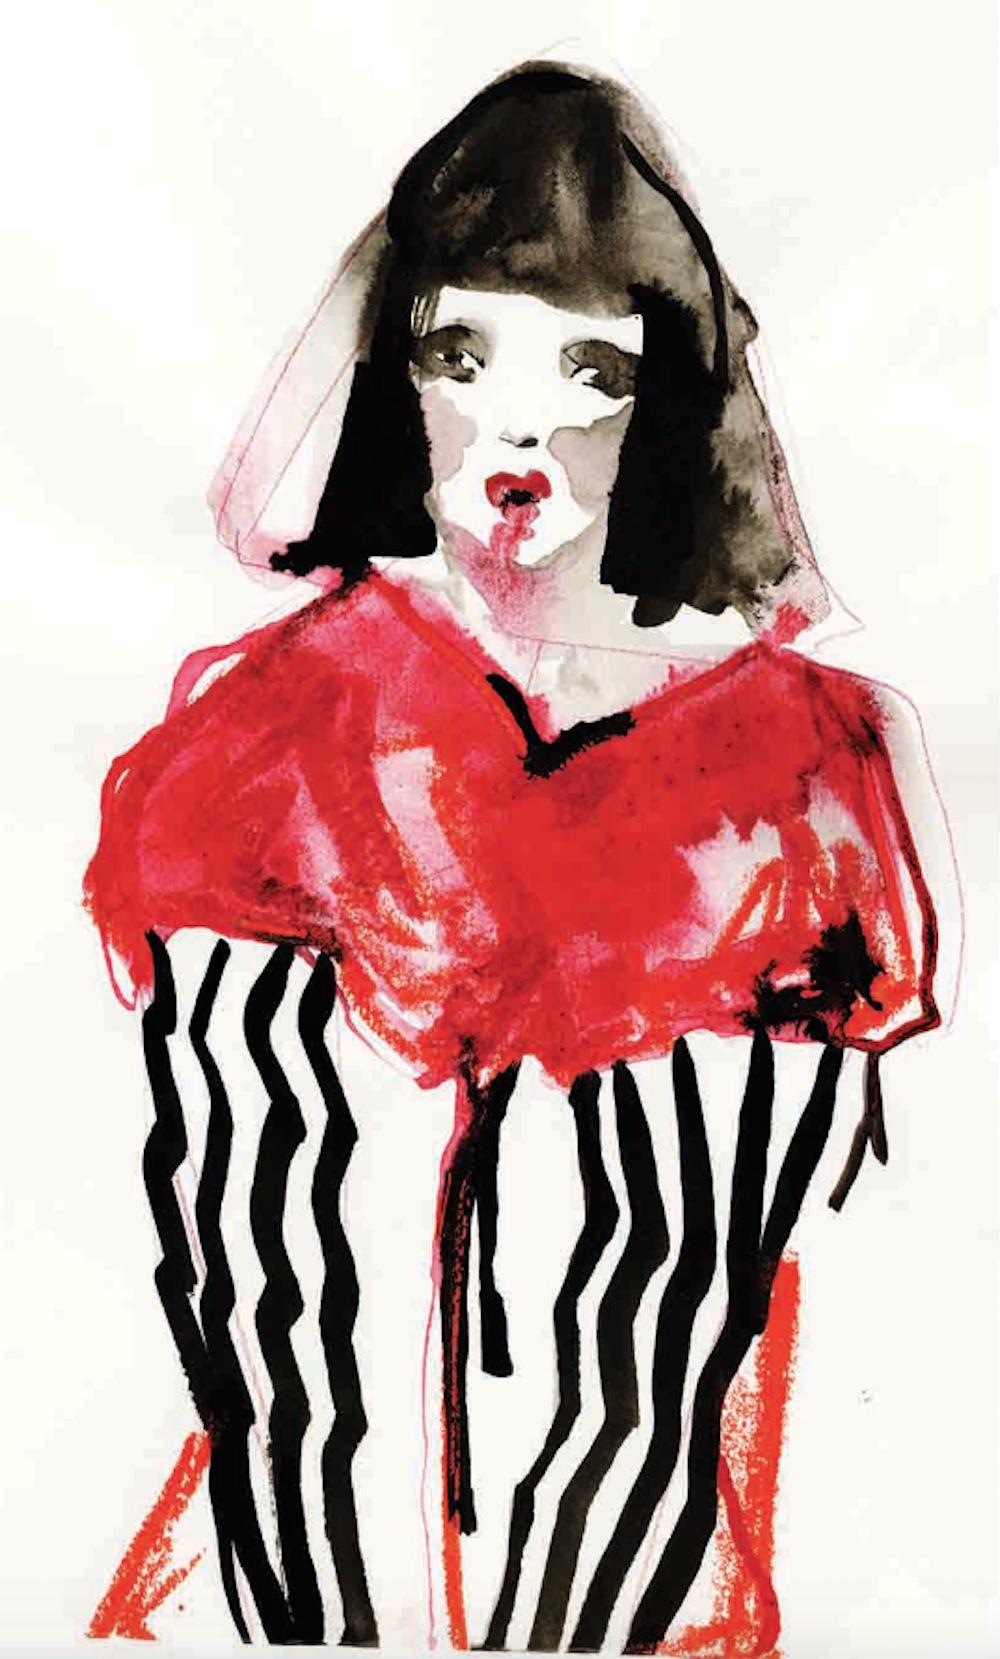 BA (Hons) Fashion Illustration graduate Holly Jade Farmer for LCFBA17.